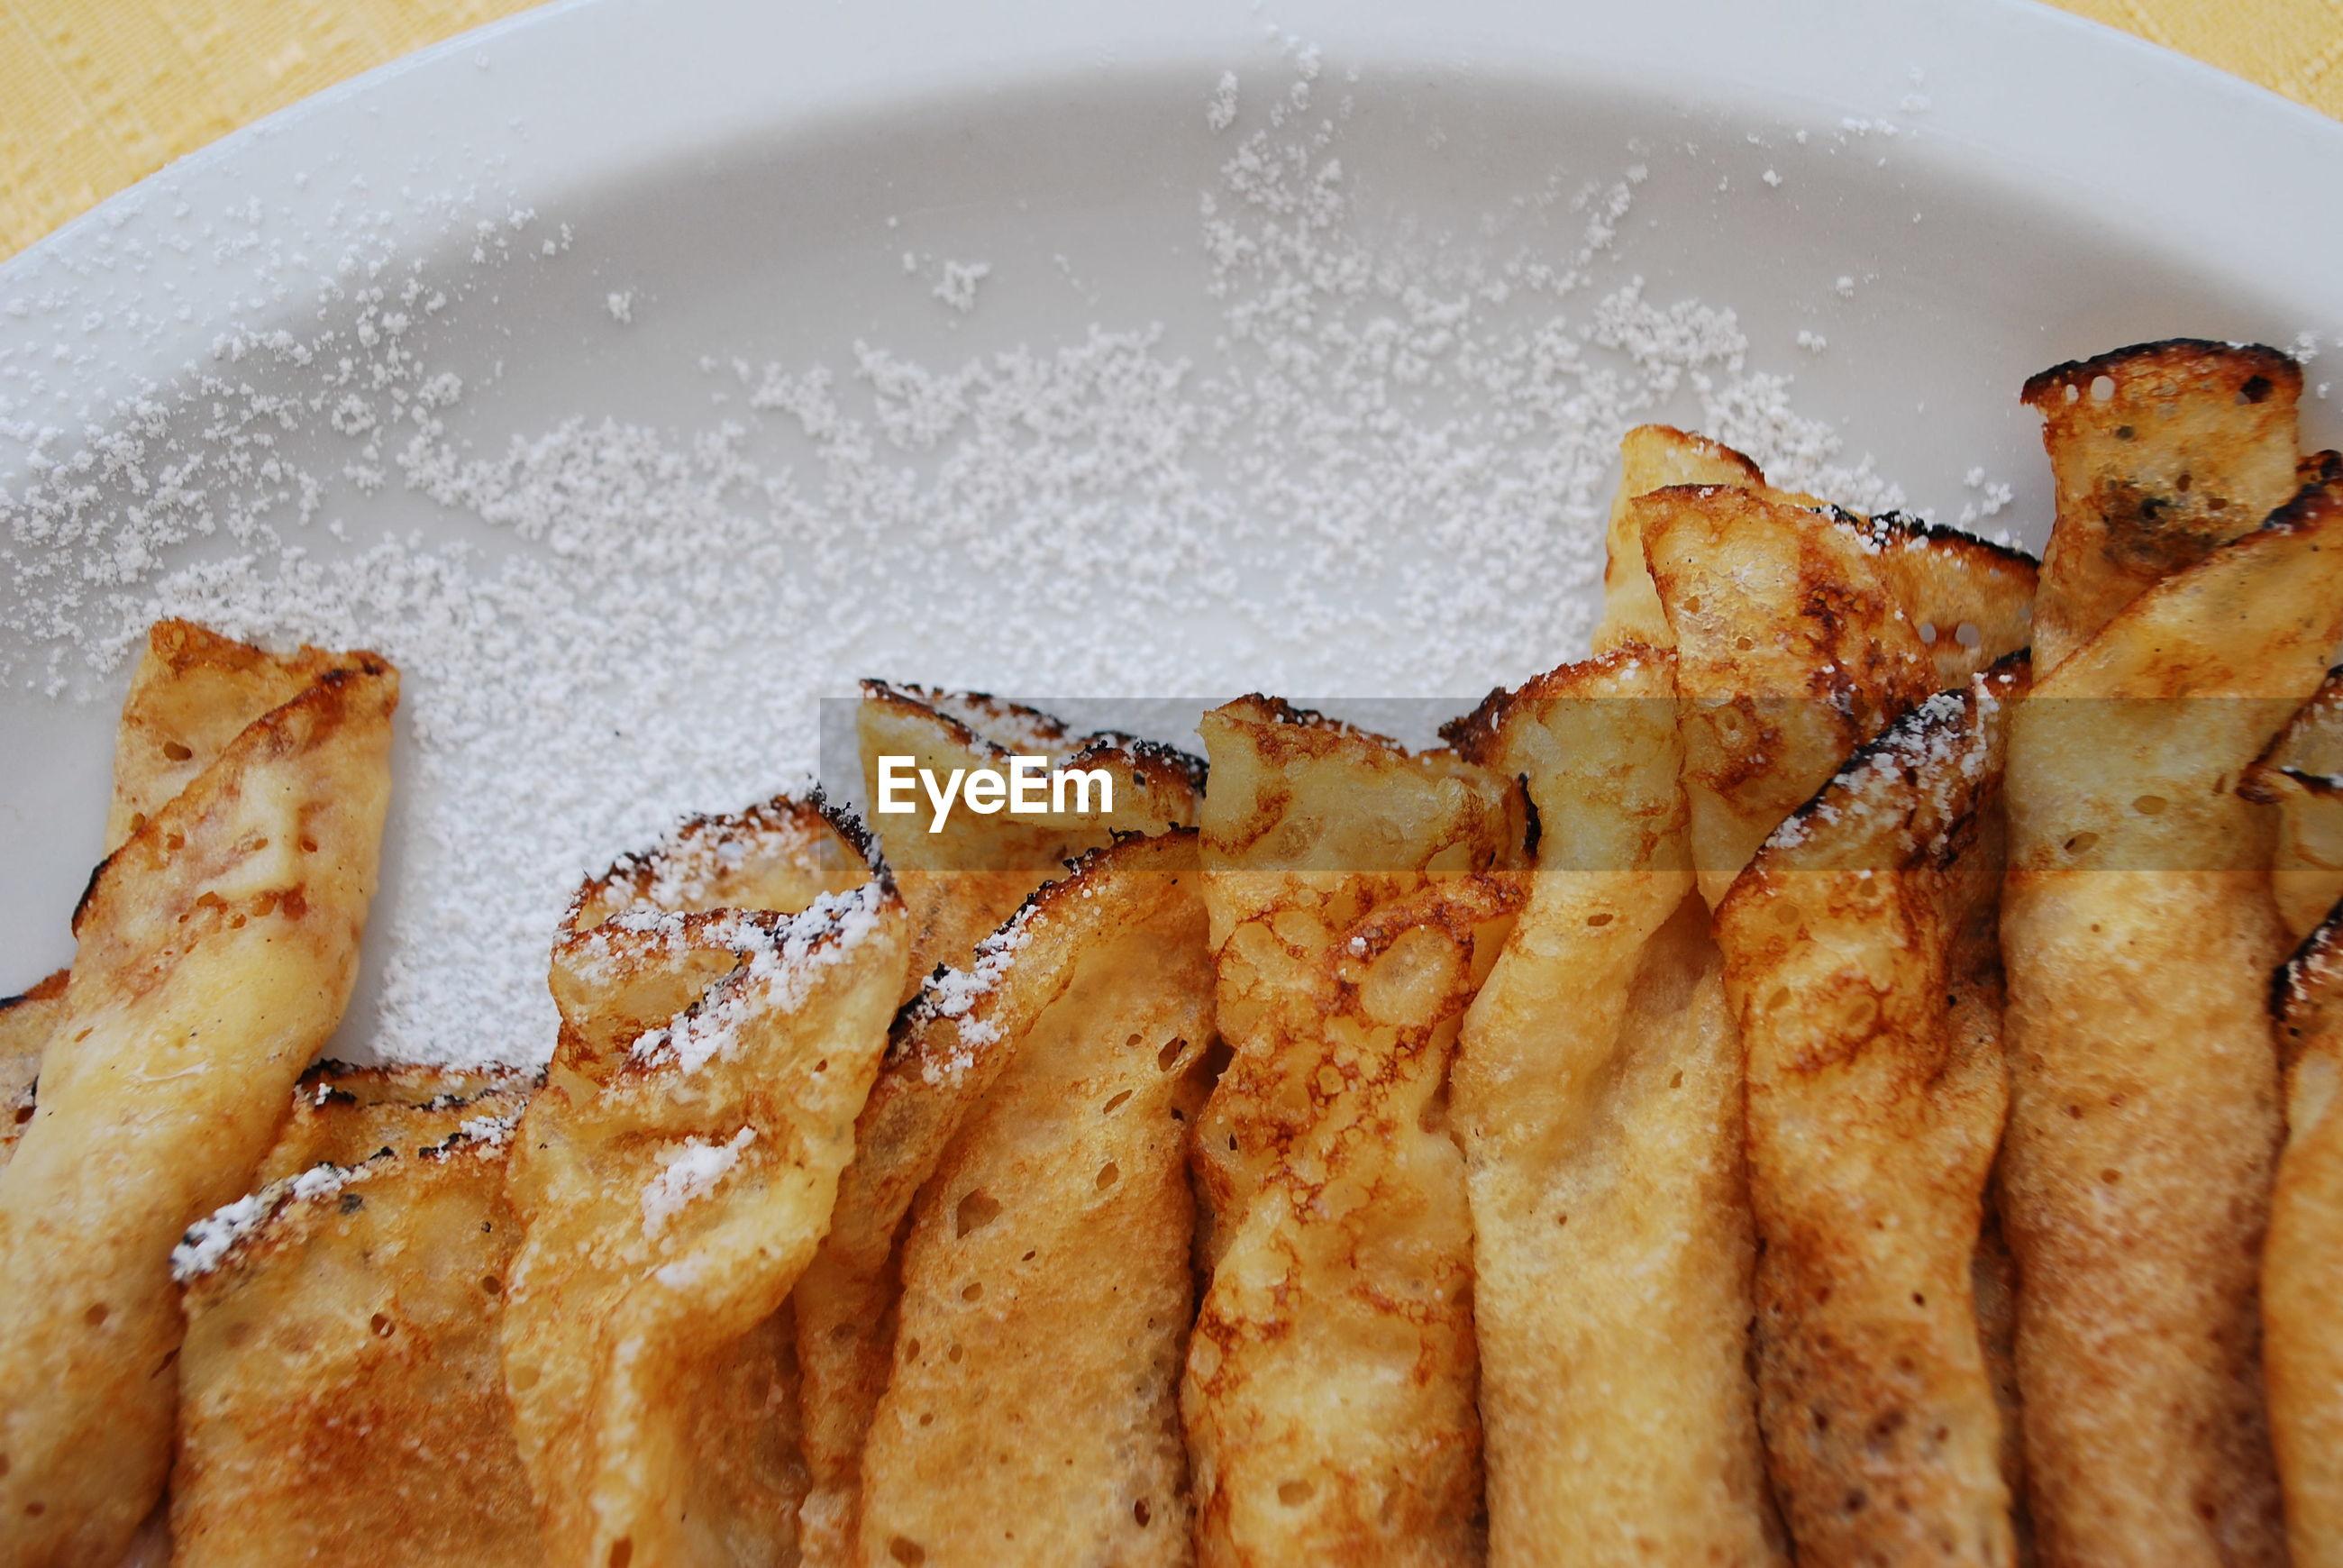 High angle view of crepes on plate